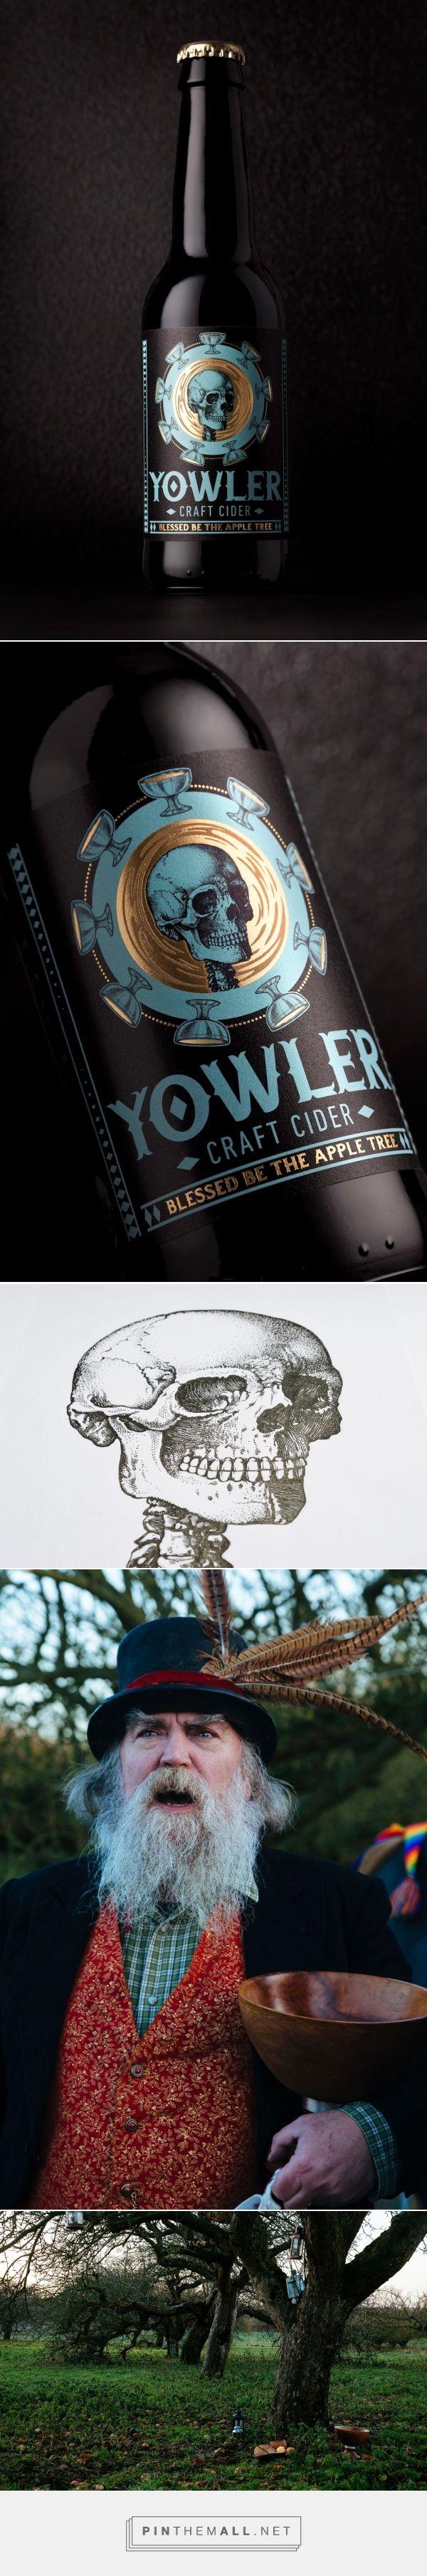 Yowler Cider label design by Sand Creative (UK) - http://www.packagingoftheworld.com/2016/08/yowler-cider.html - http://www.packagingoftheworld.com/2016/08/yowler-cider.html